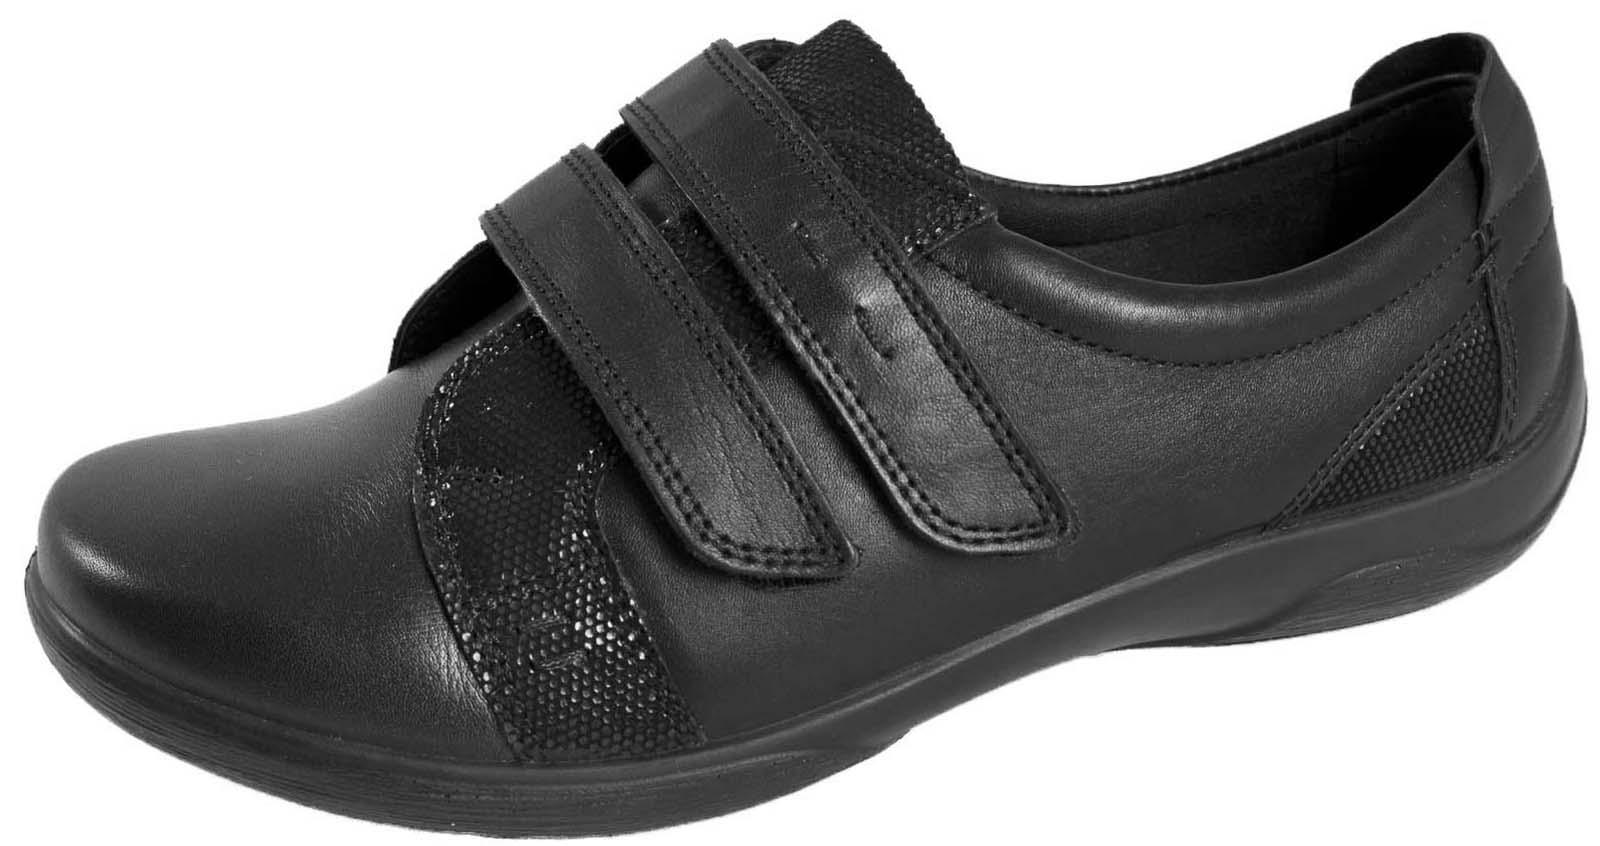 Shoes Eeee Fitting